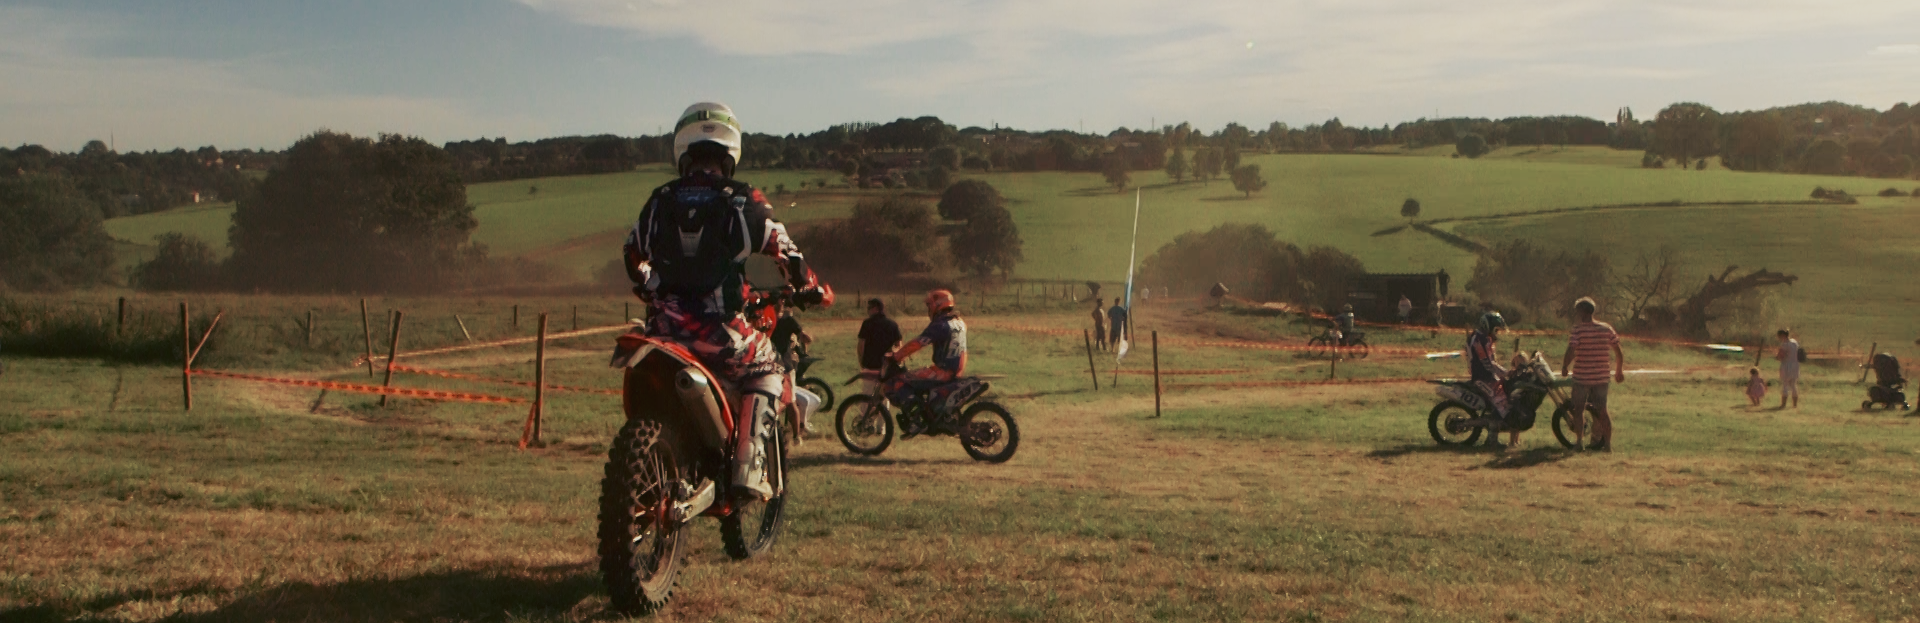 motocross, jobé, race